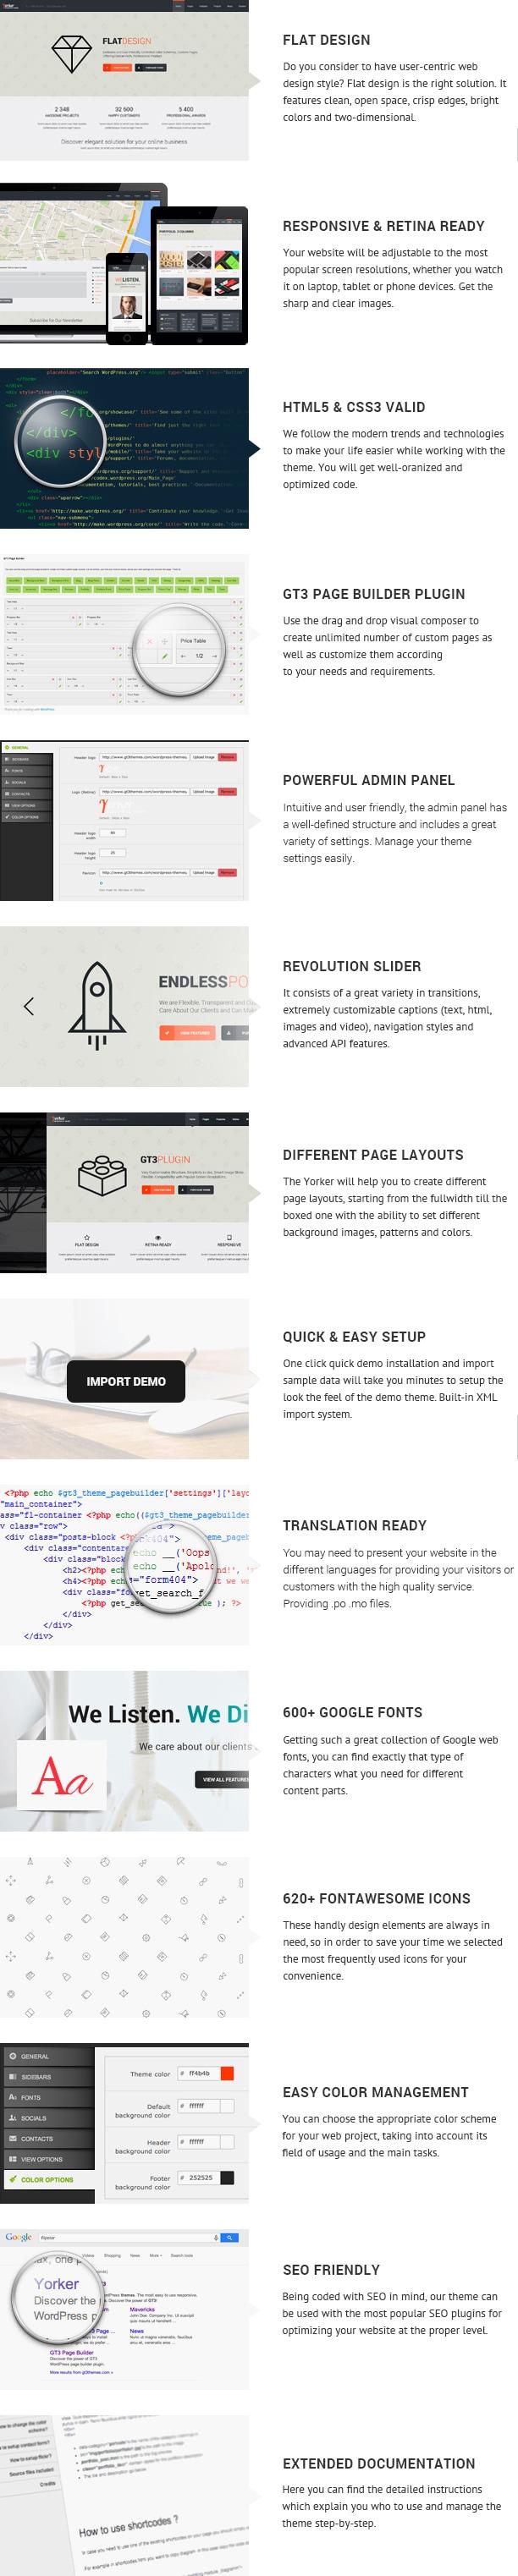 Yorker Business WordPress Theme - 1